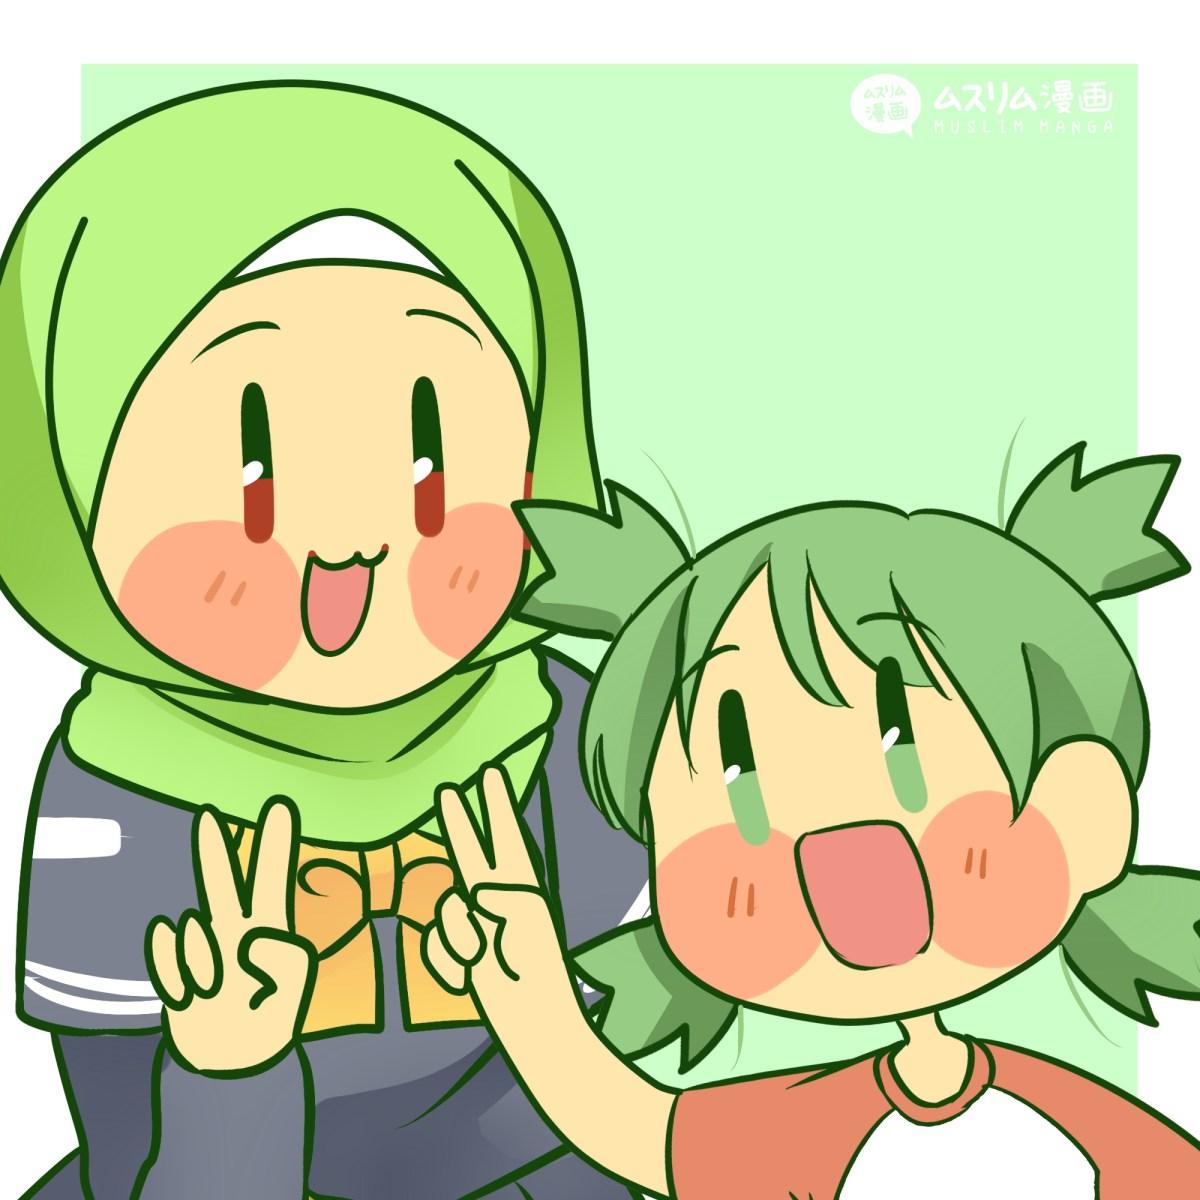 fanart aya and yotsuba